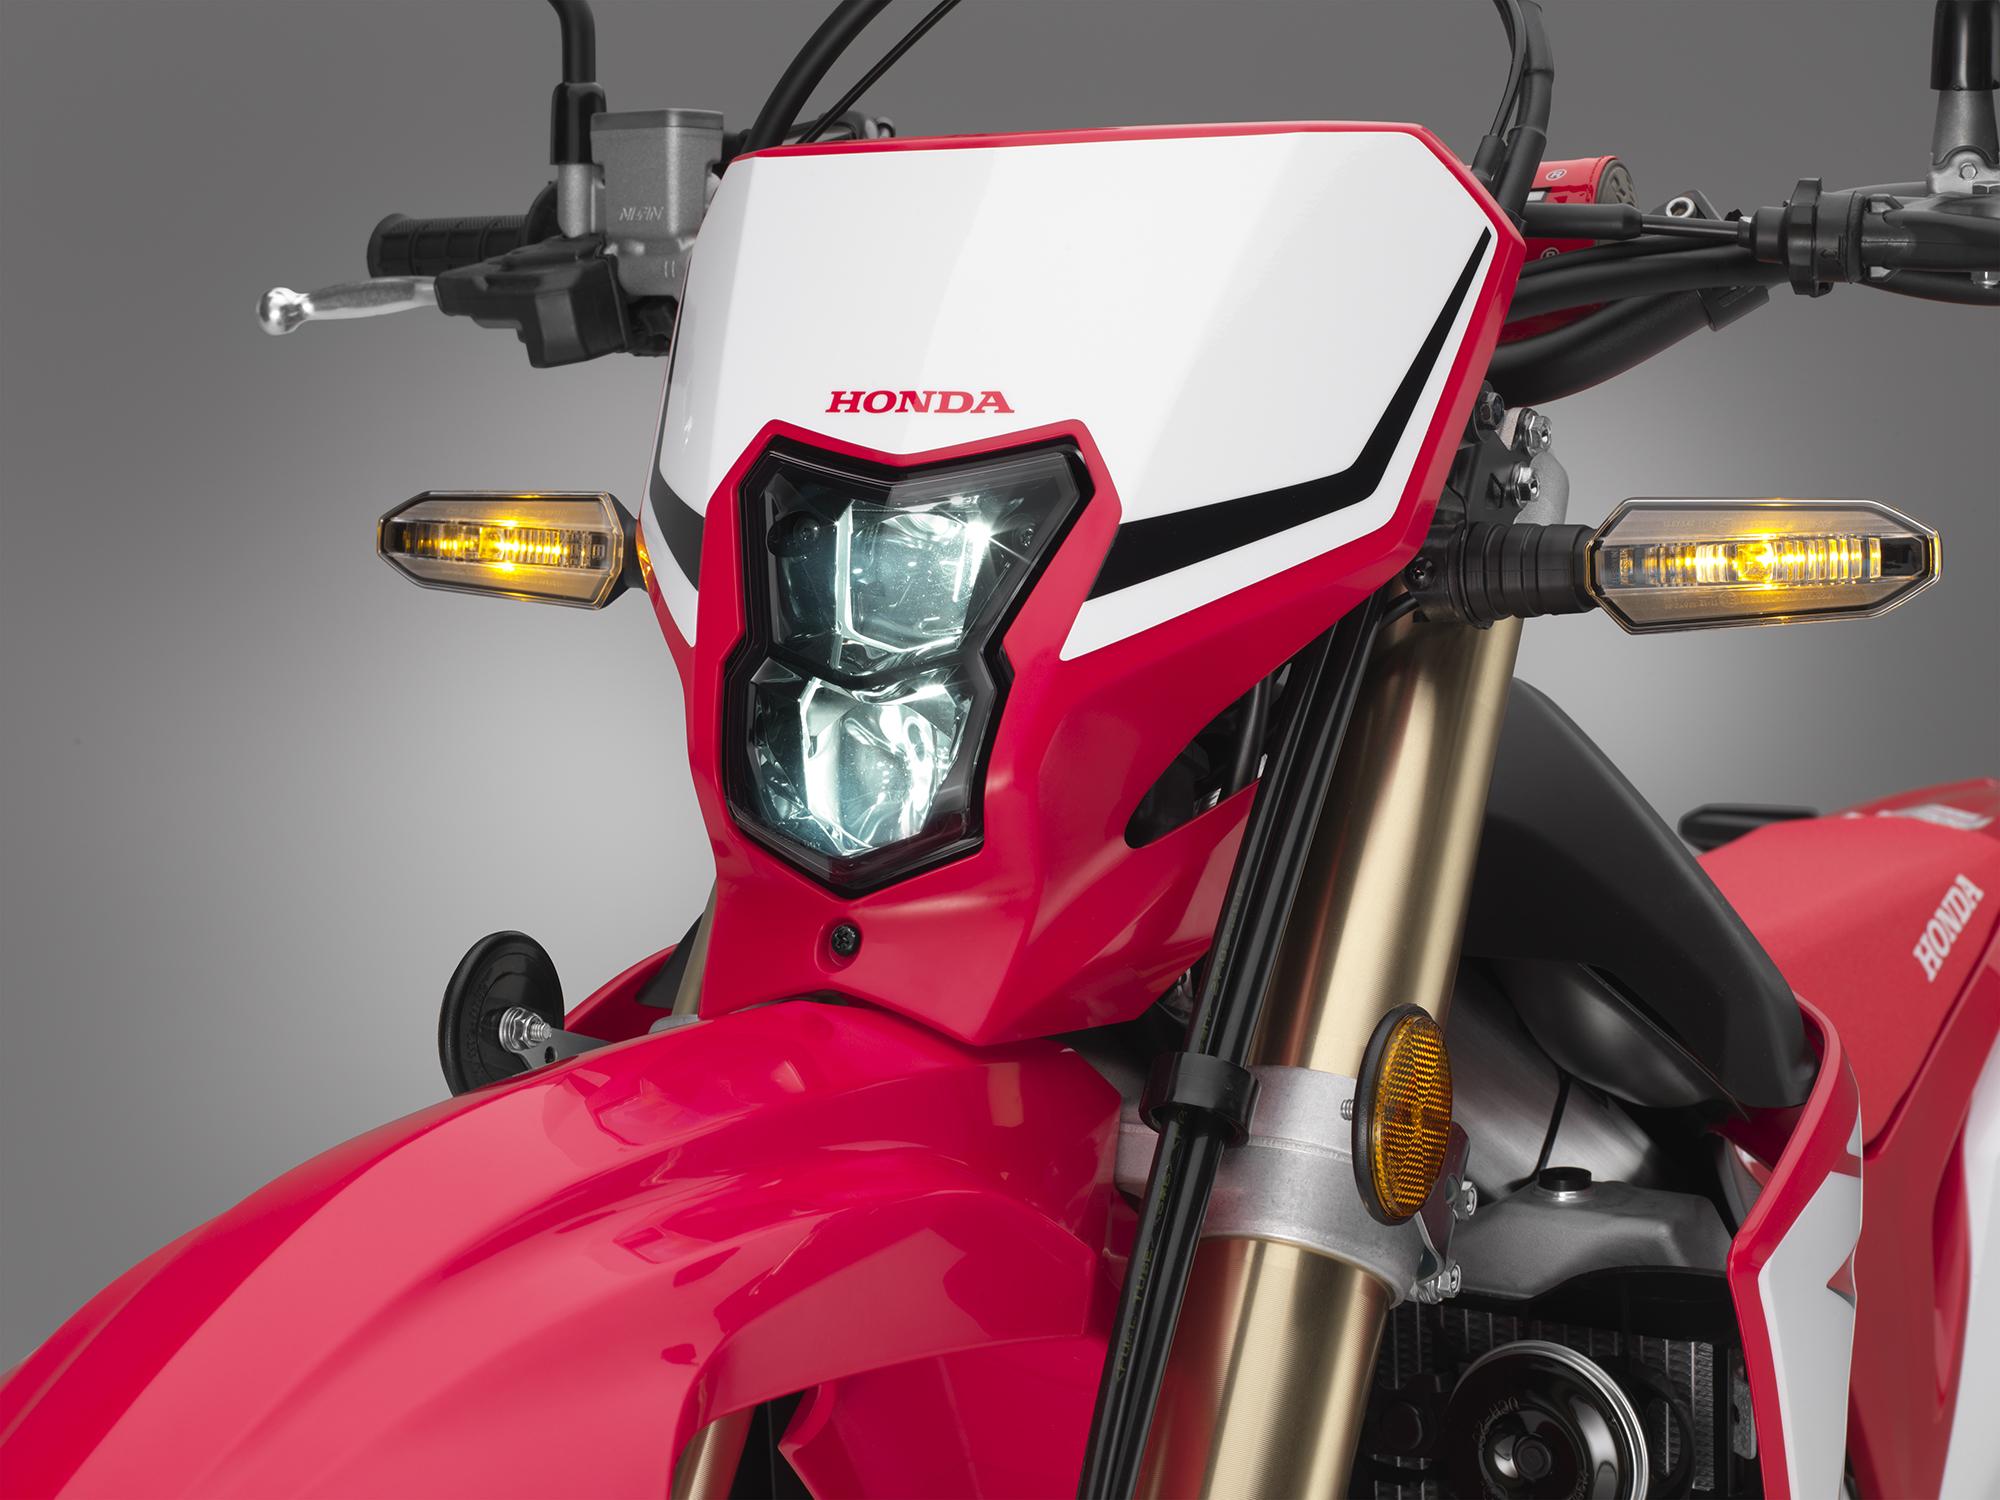 19 Honda CRF450L_headlight on.jpg